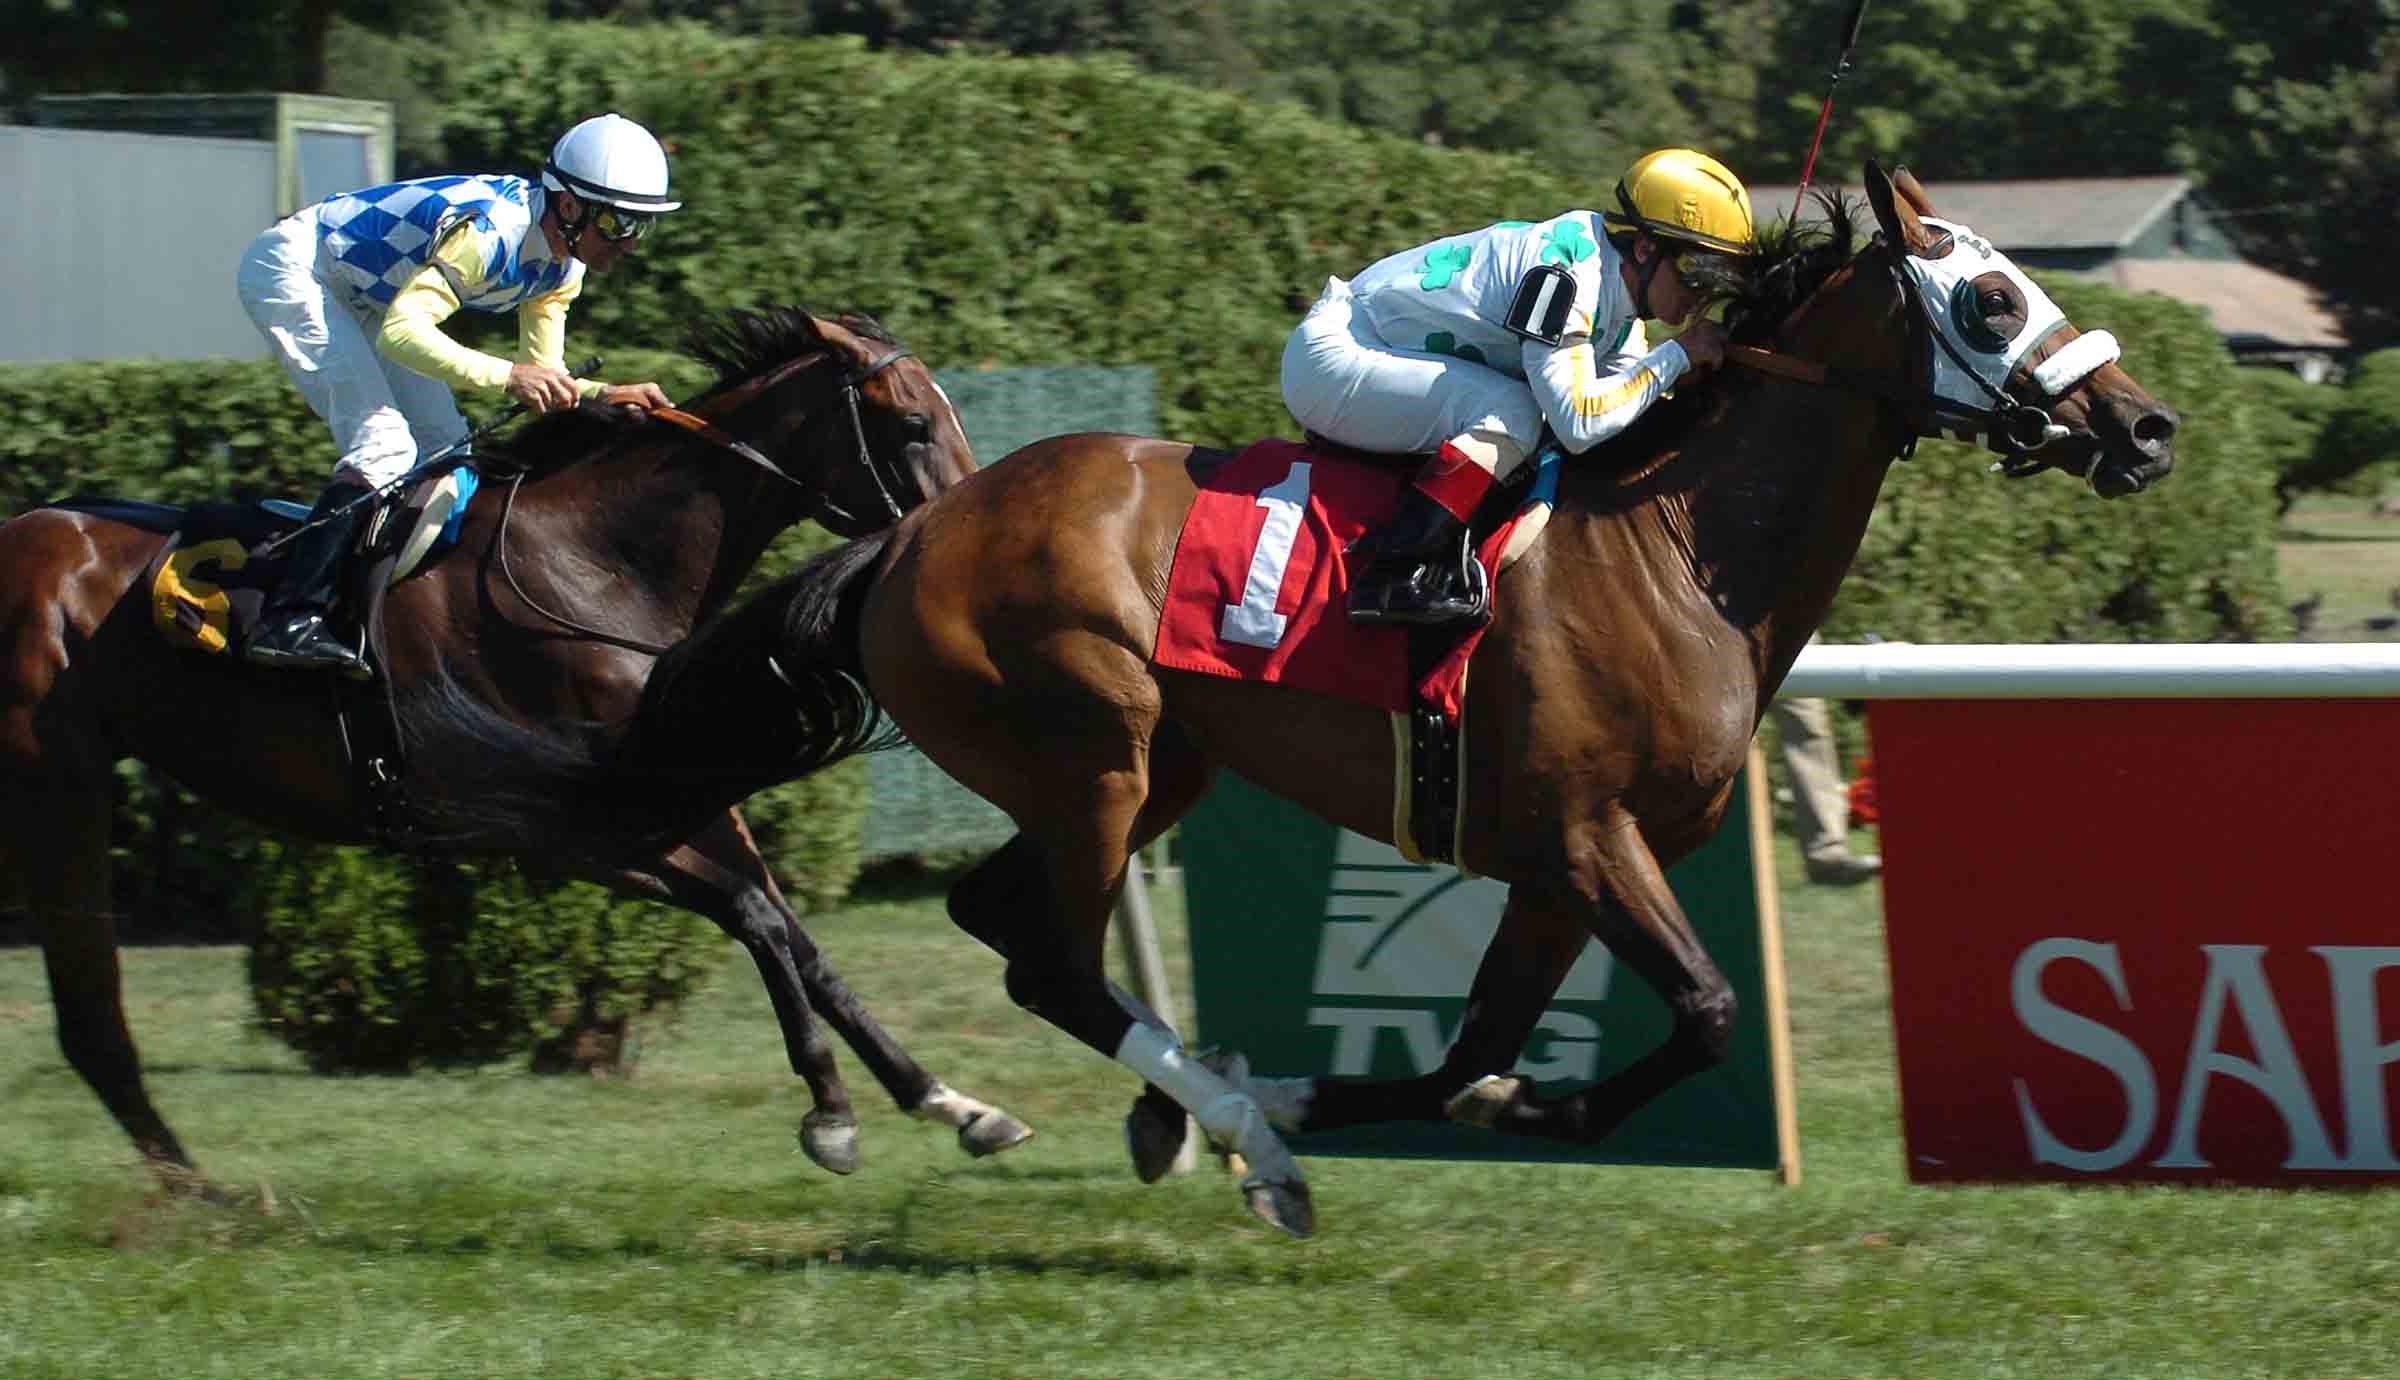 Kats Golden Ways - August 5, 2007 at Saratoga